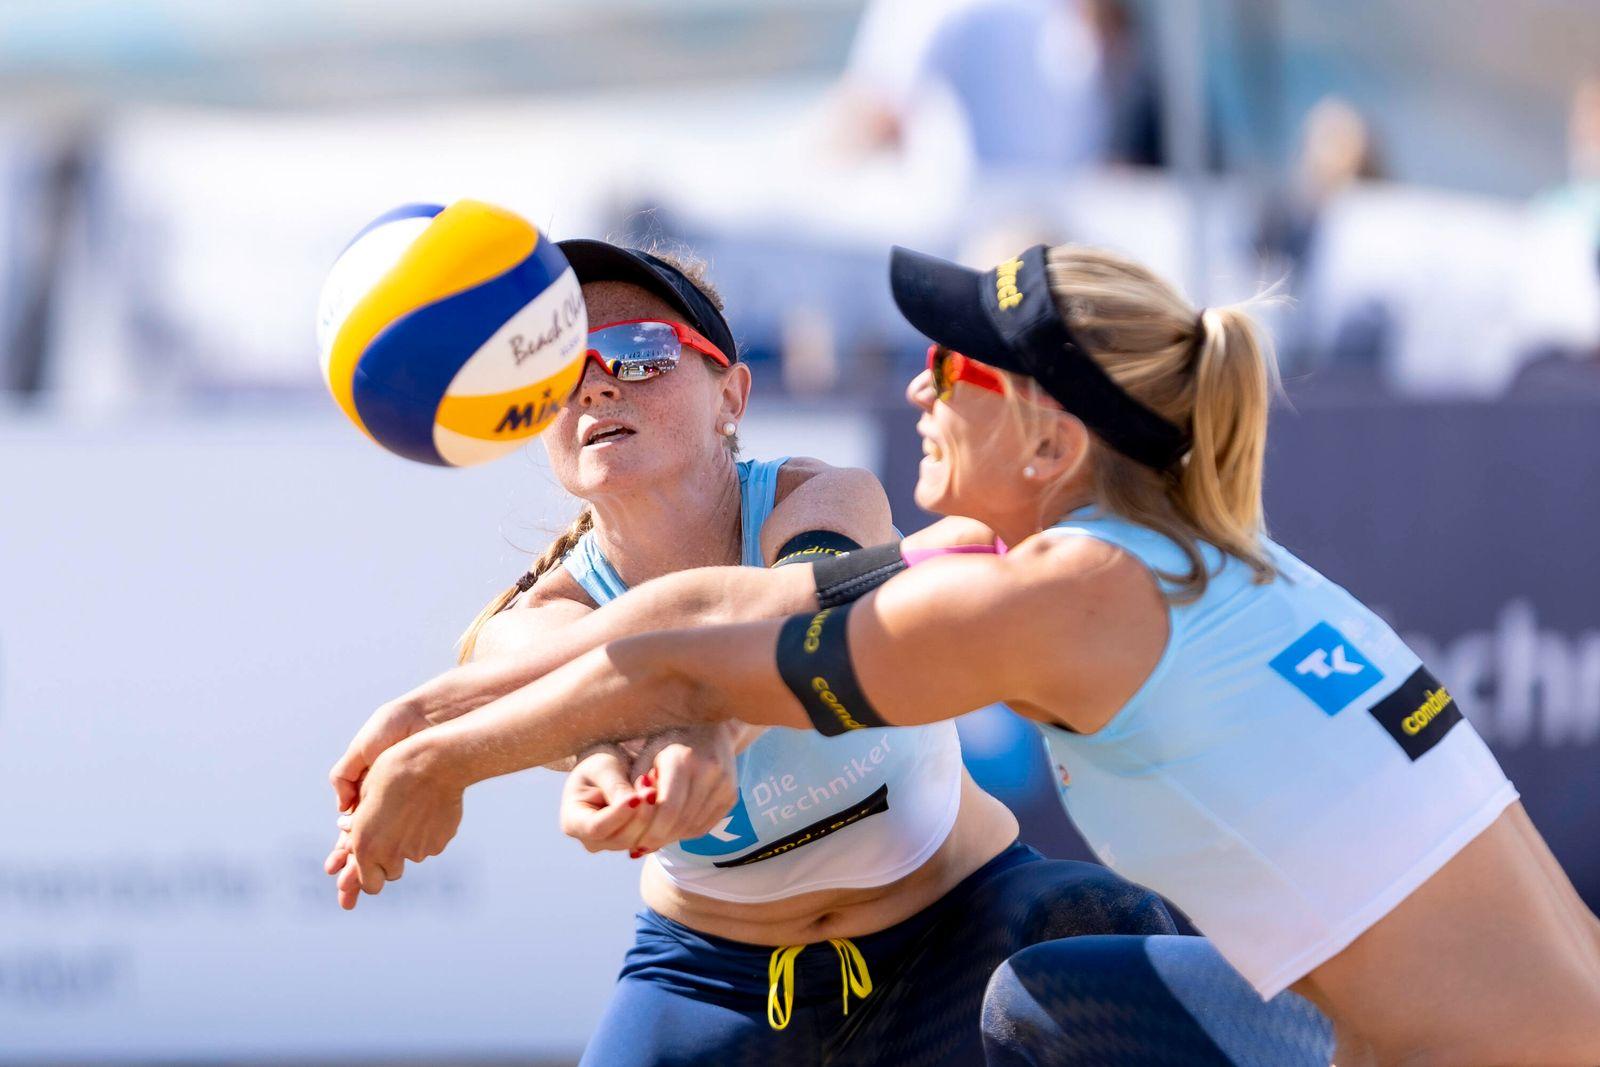 Julia Sude (blau) und Karla Borger (blau). Borger / Sude vs. Aulenbrock / Ferger, Beachvolleyball, Deutsche Meisterscha